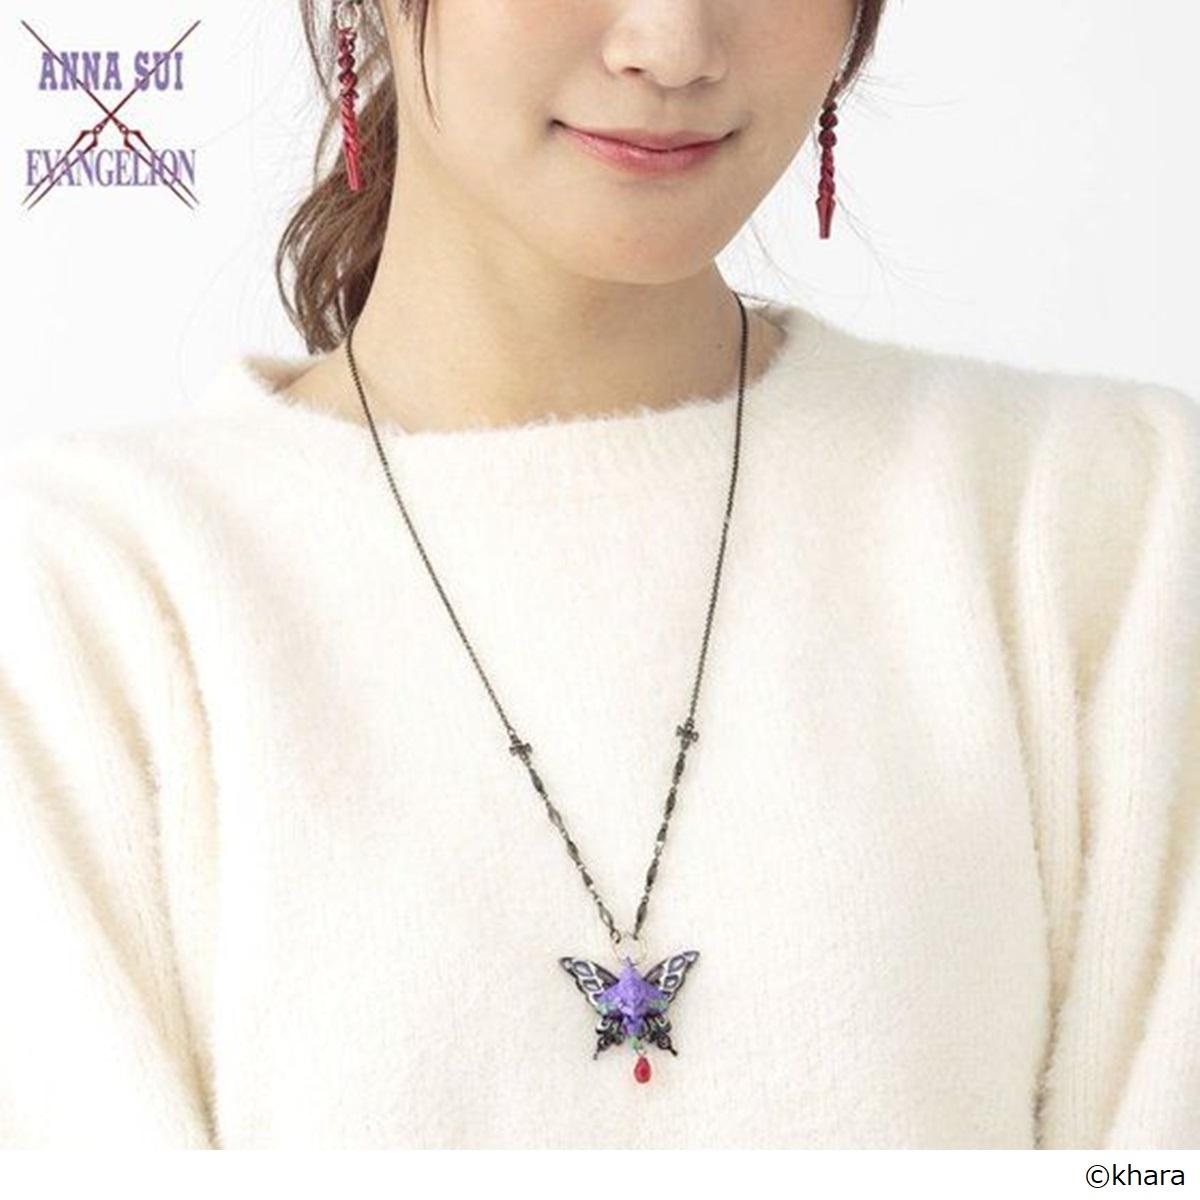 Evangelion: EVA-01 Necklace—Evangelion/Anna Sui Collaboration  [Dec 2021 Delivery]